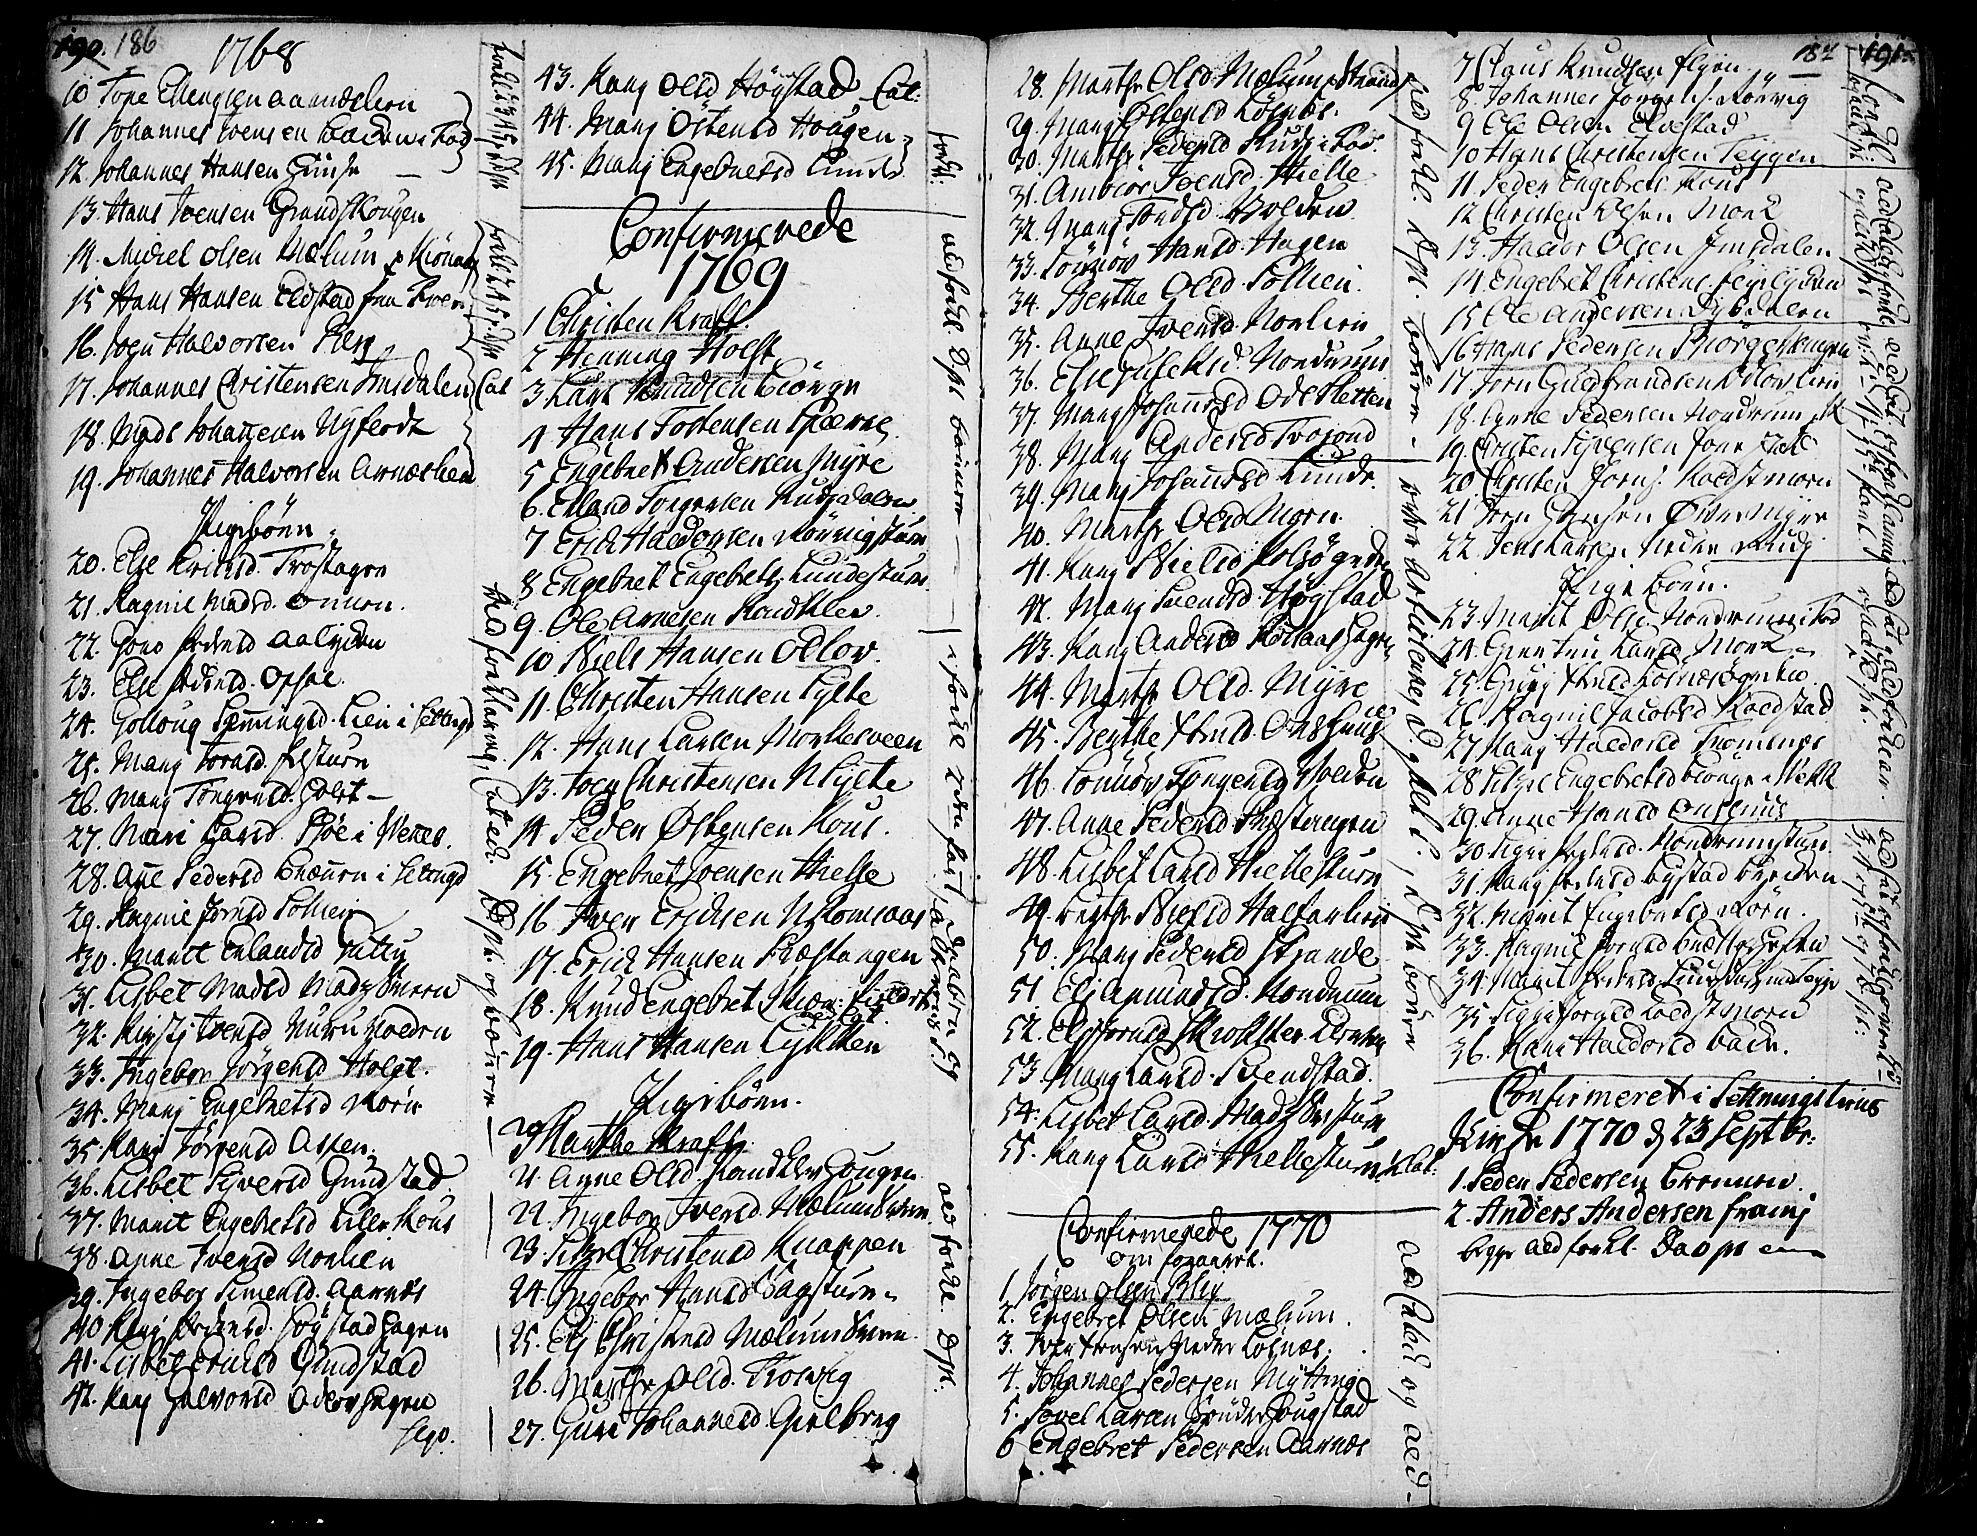 SAH, Ringebu prestekontor, Ministerialbok nr. 2, 1734-1780, s. 186-187